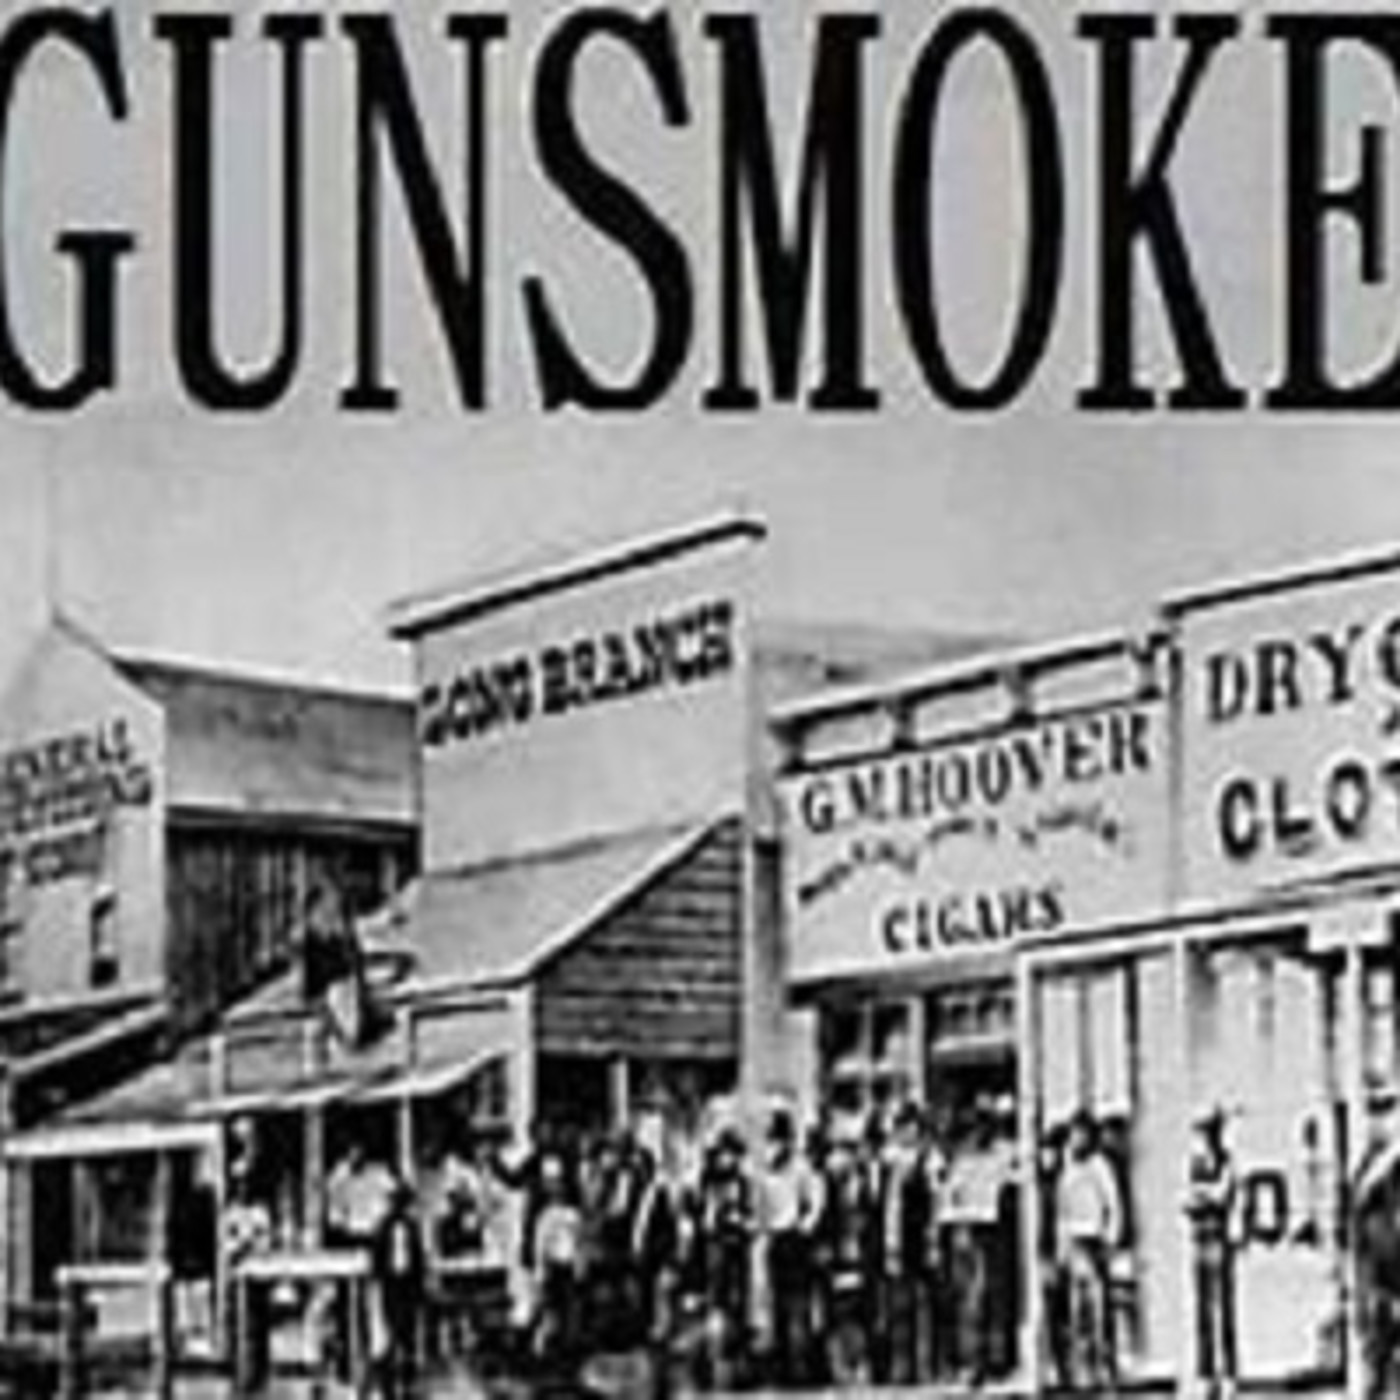 Gunsmoke 61-04-23 (472) Father and Son